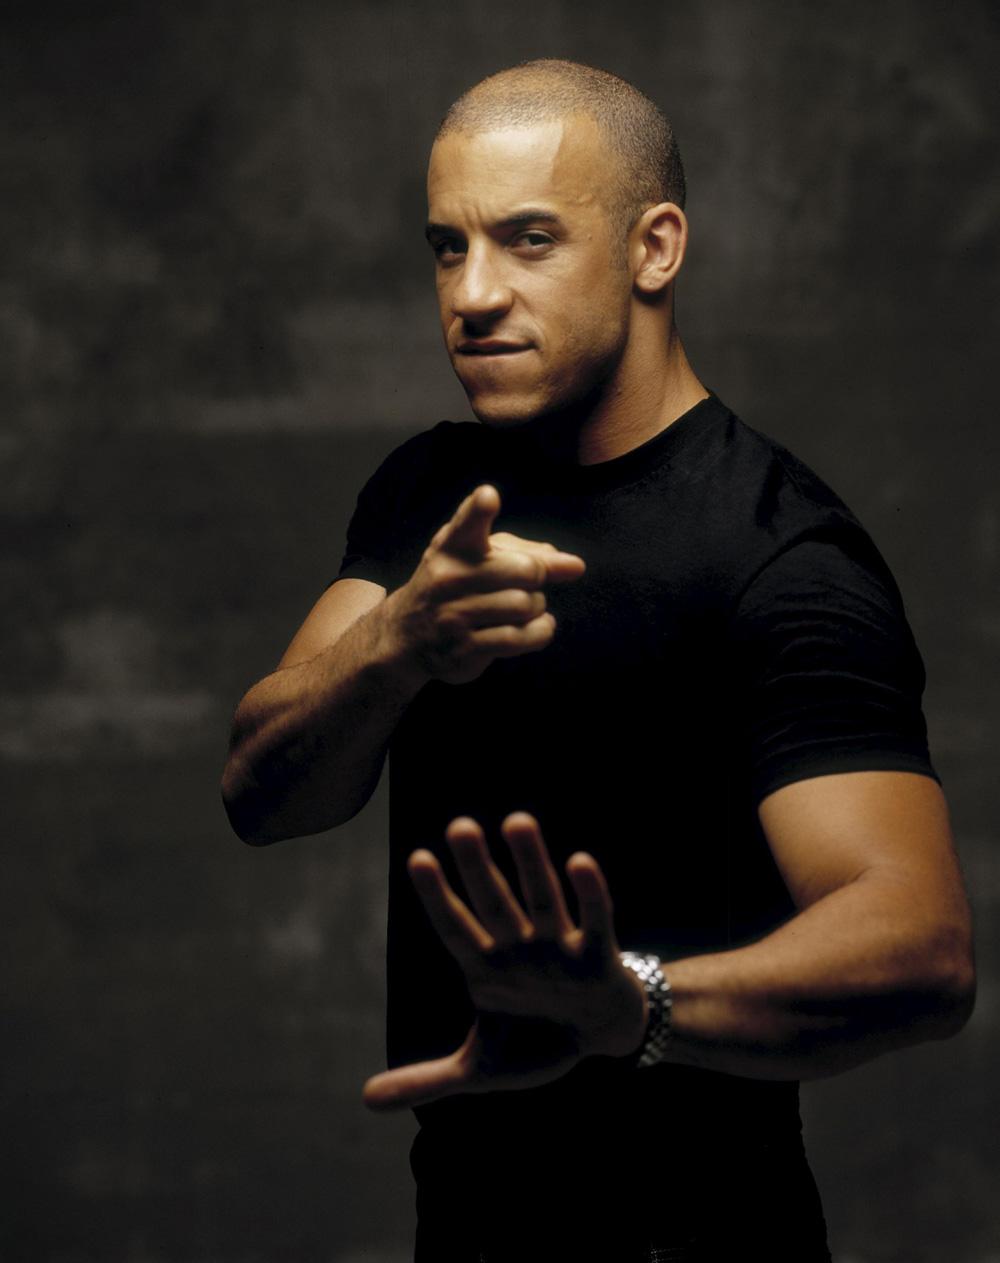 Vin Diesel BiographyWallpapers and Profile Global